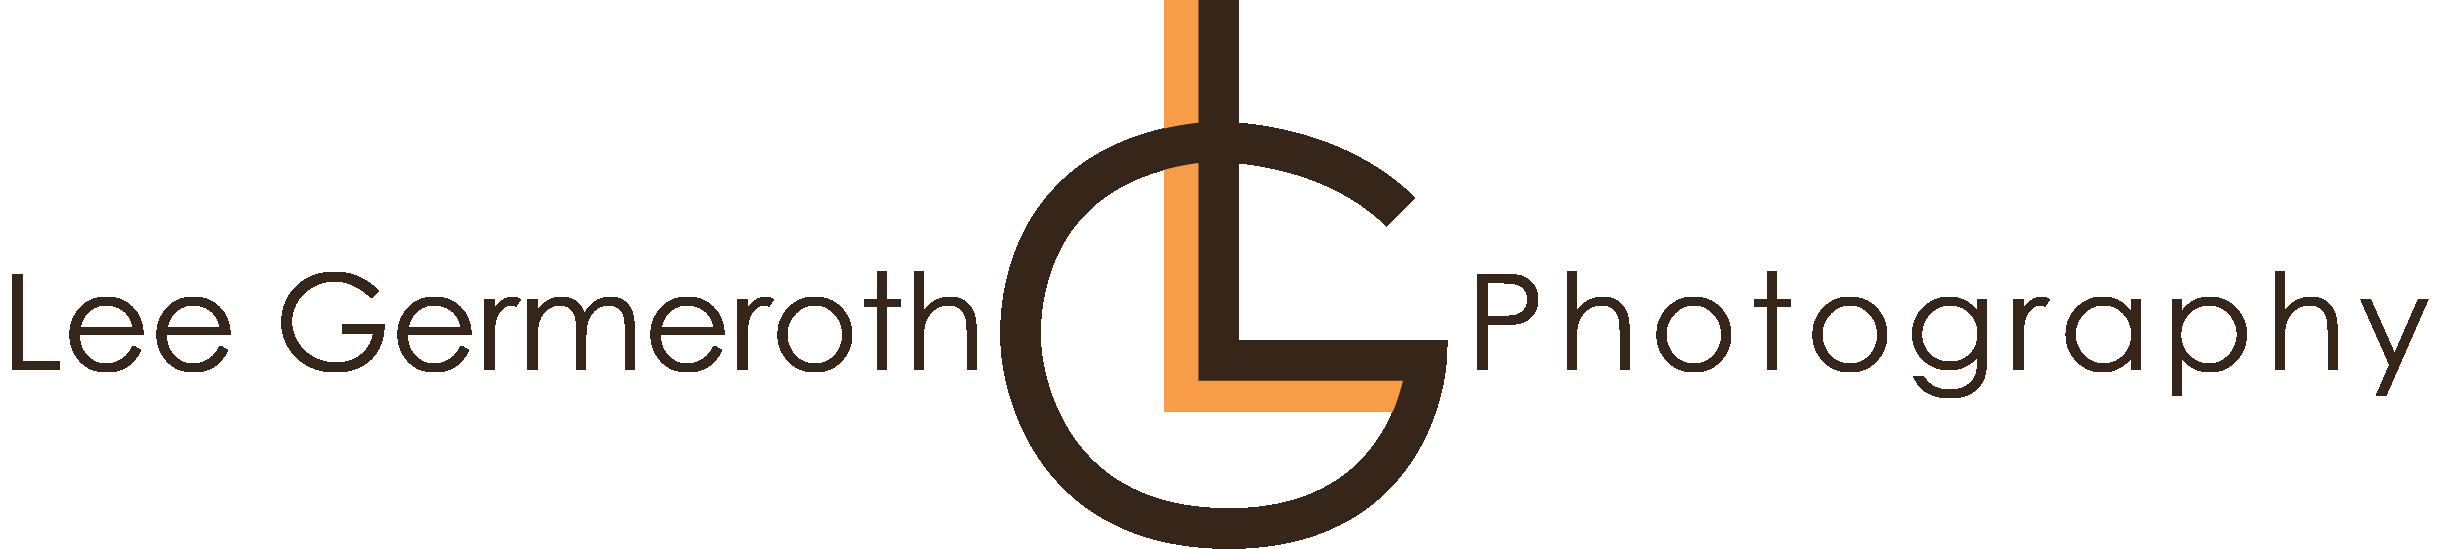 Lee Germeroth Photography logo